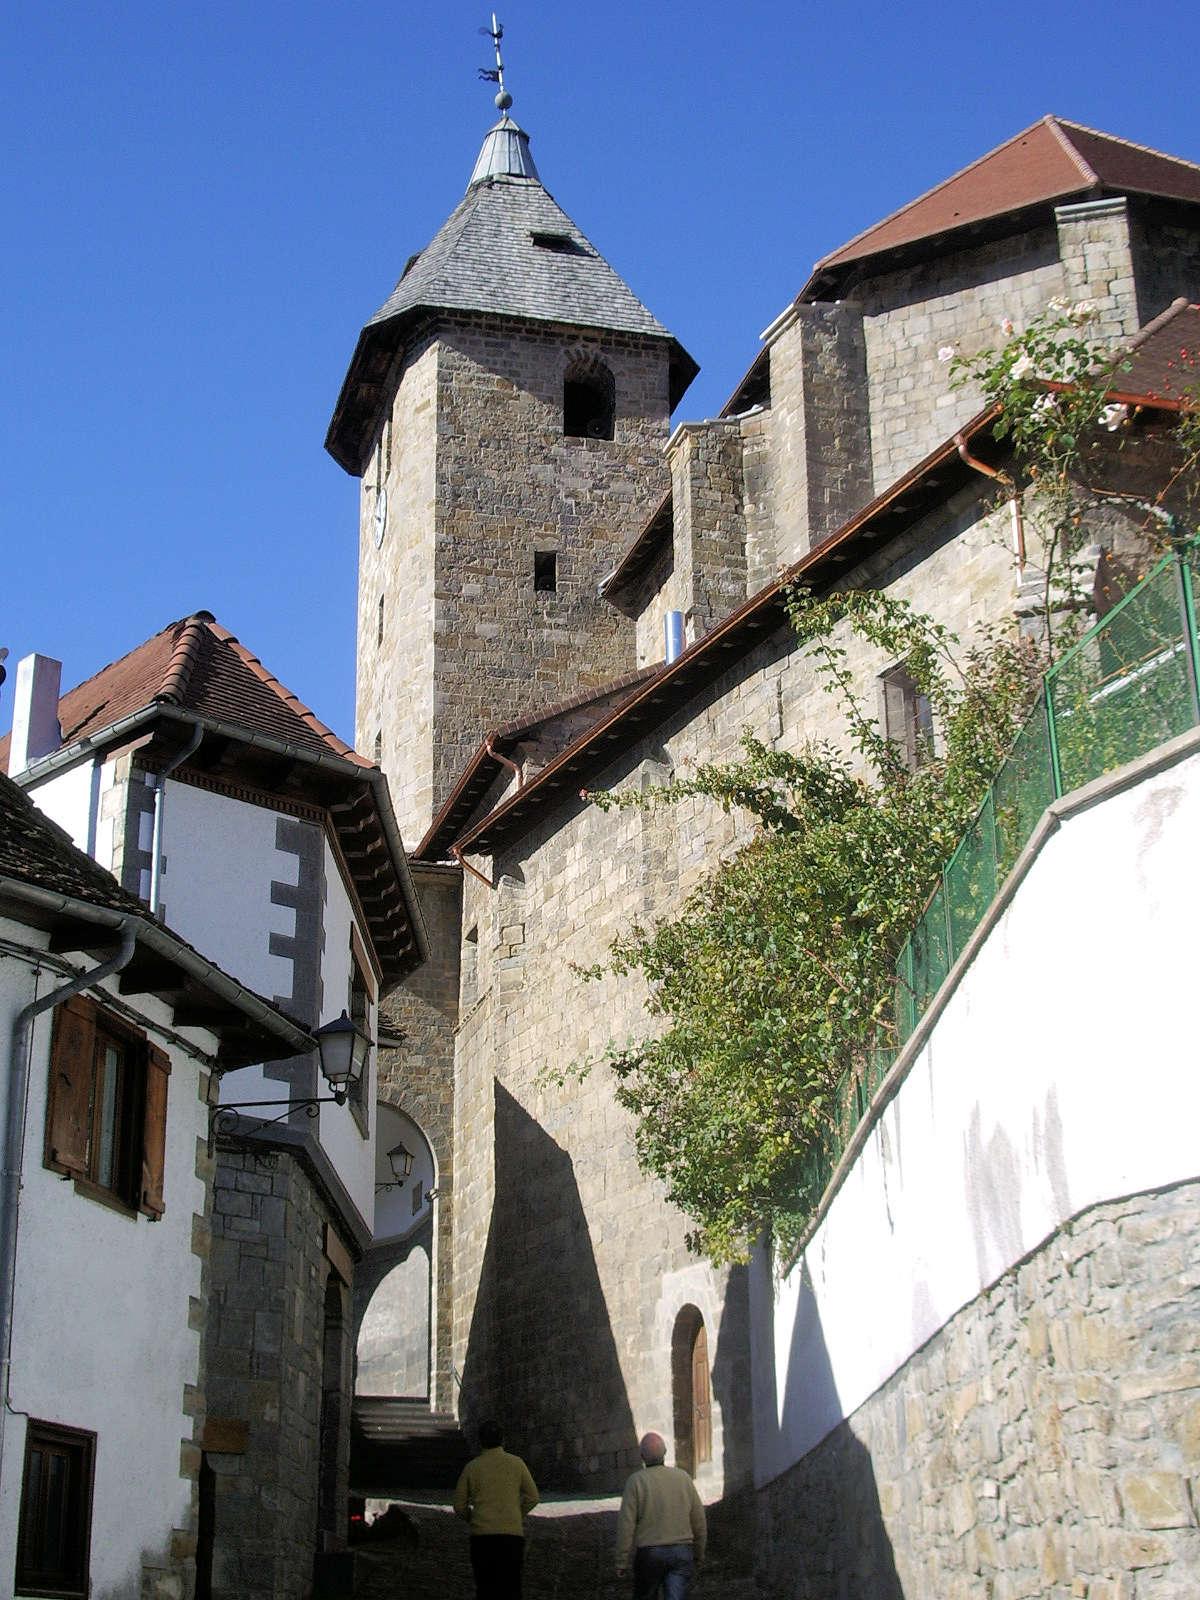 Iglesia-de-San-Juan-Evangelista-Ochagavía-Navarra